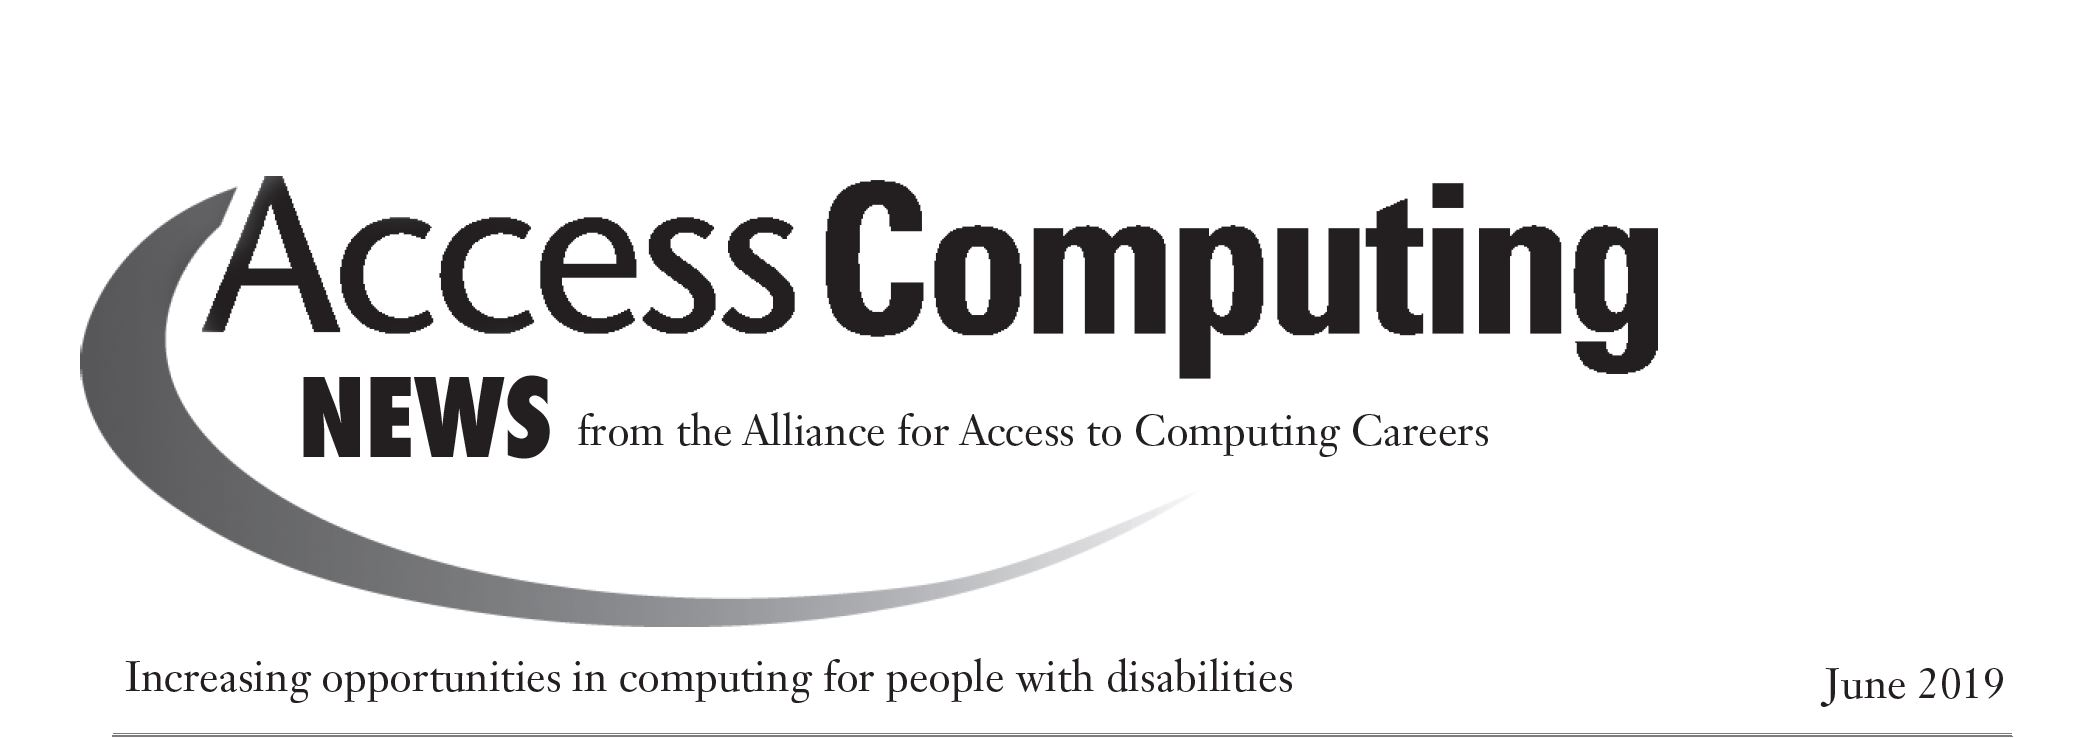 AccessComputing News June 2019 Header